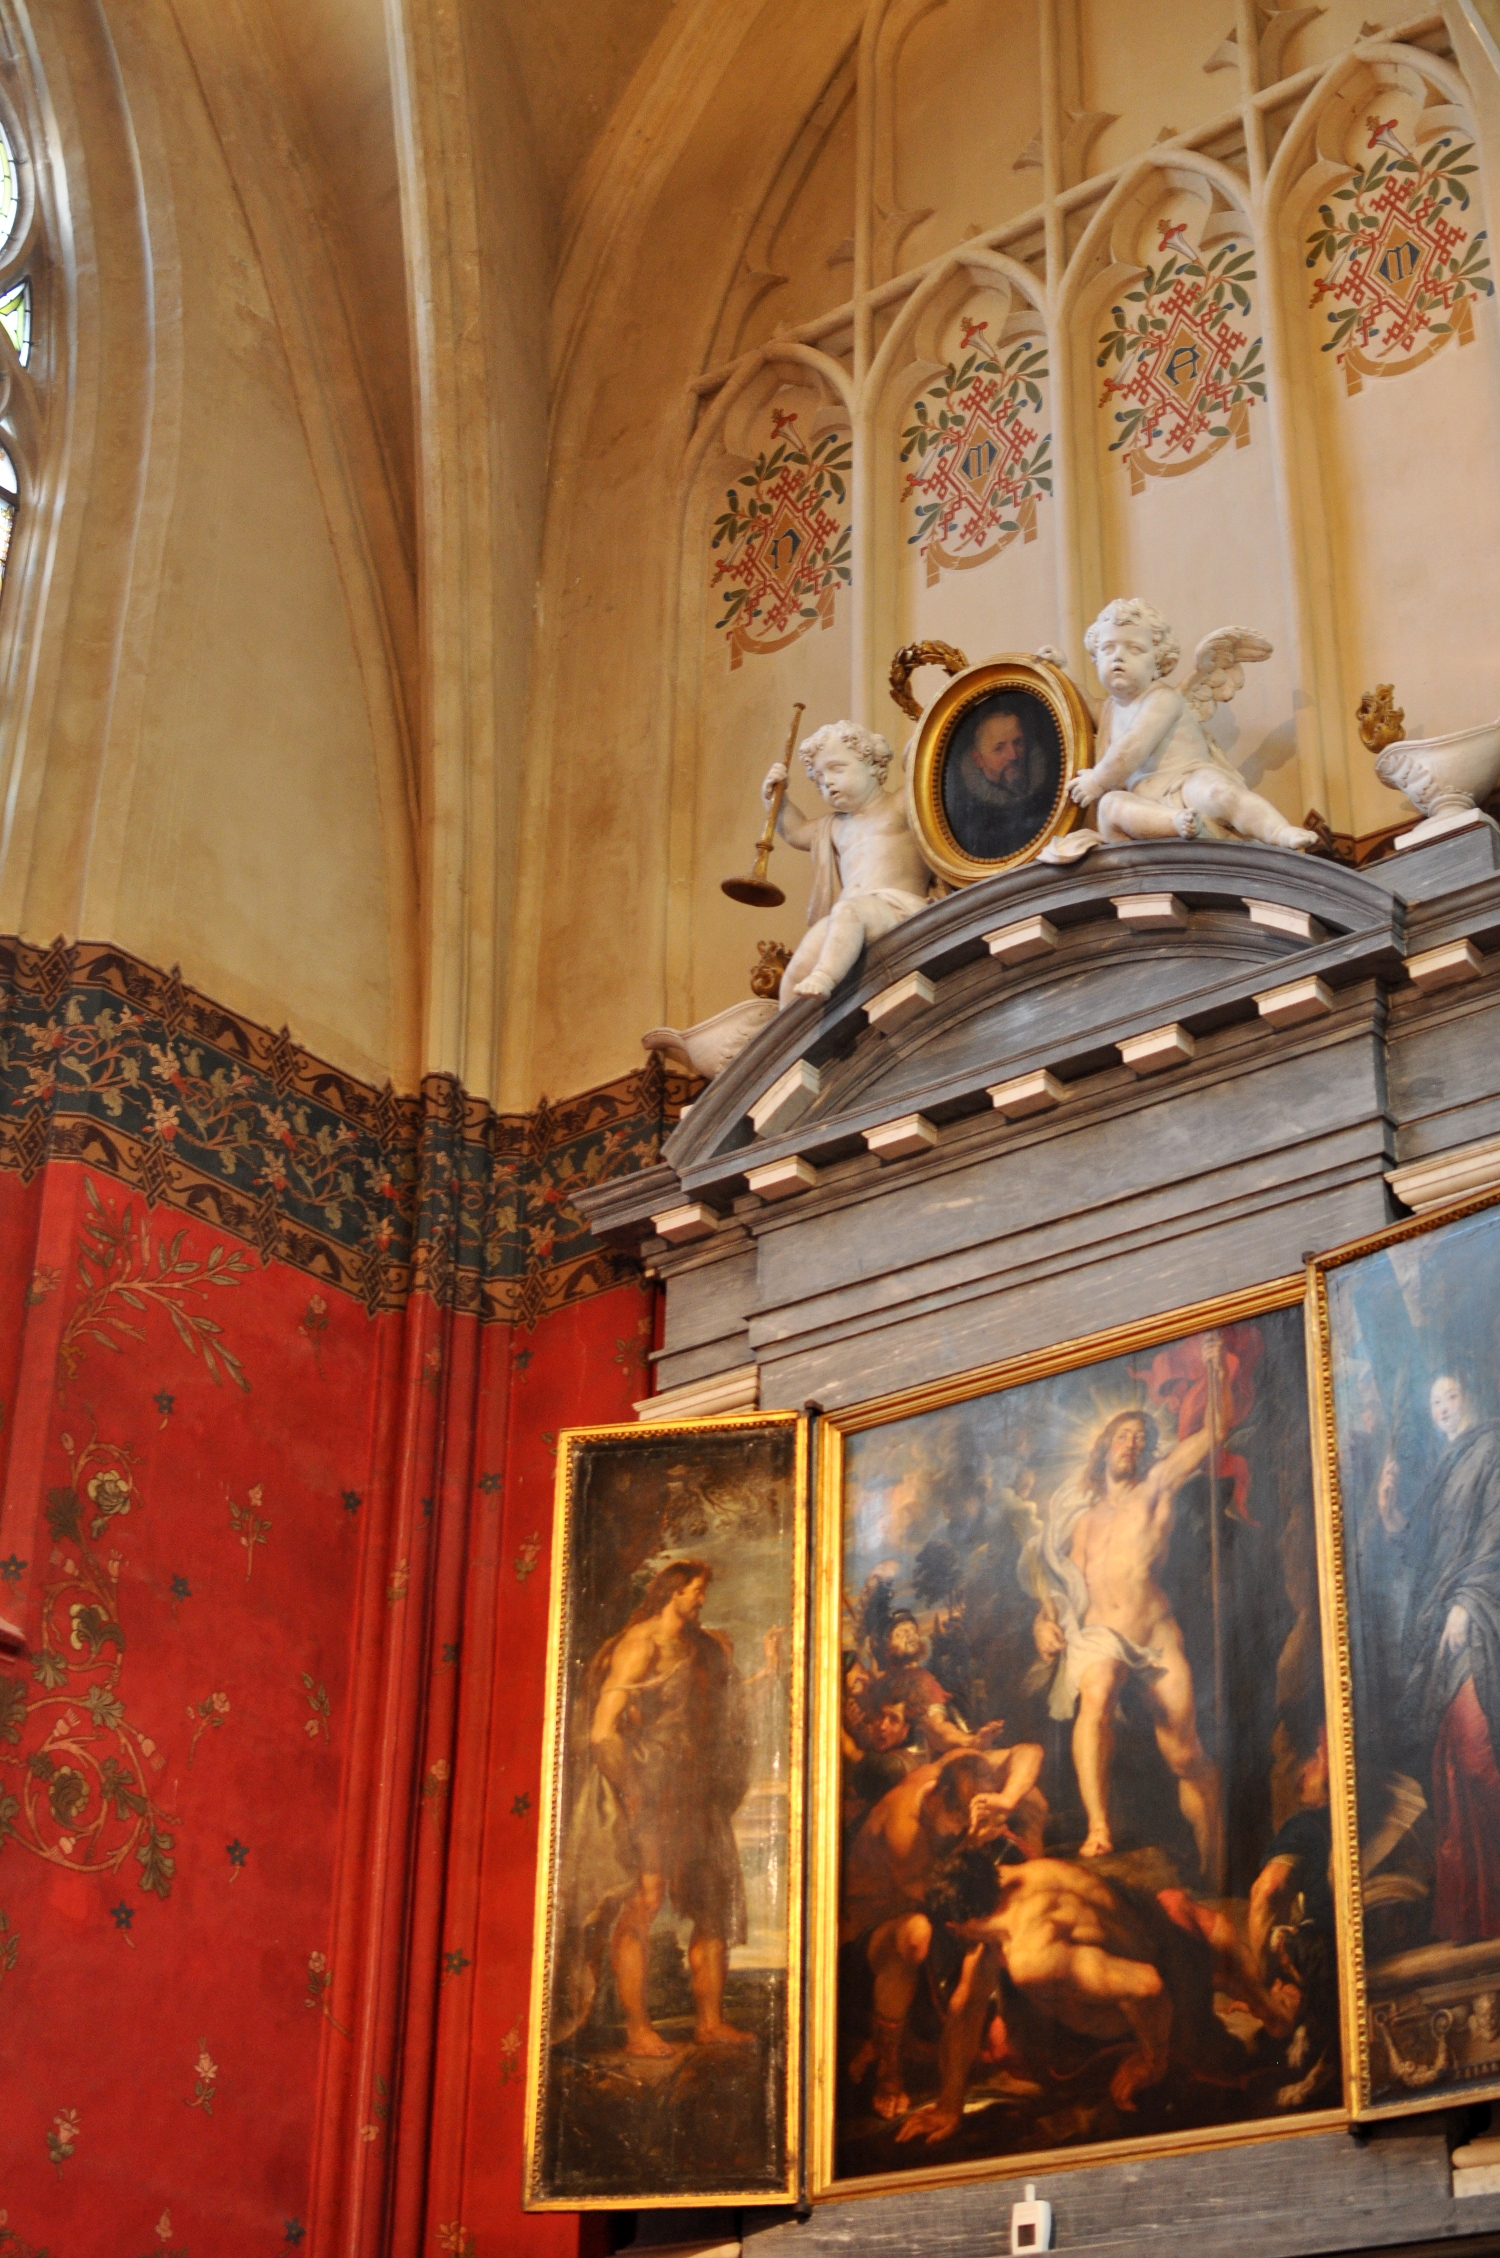 rocaille-blog-cattedrale-anversa-rubens-Onze-Lieve-Vrouwekathedraal-antwerpen-11